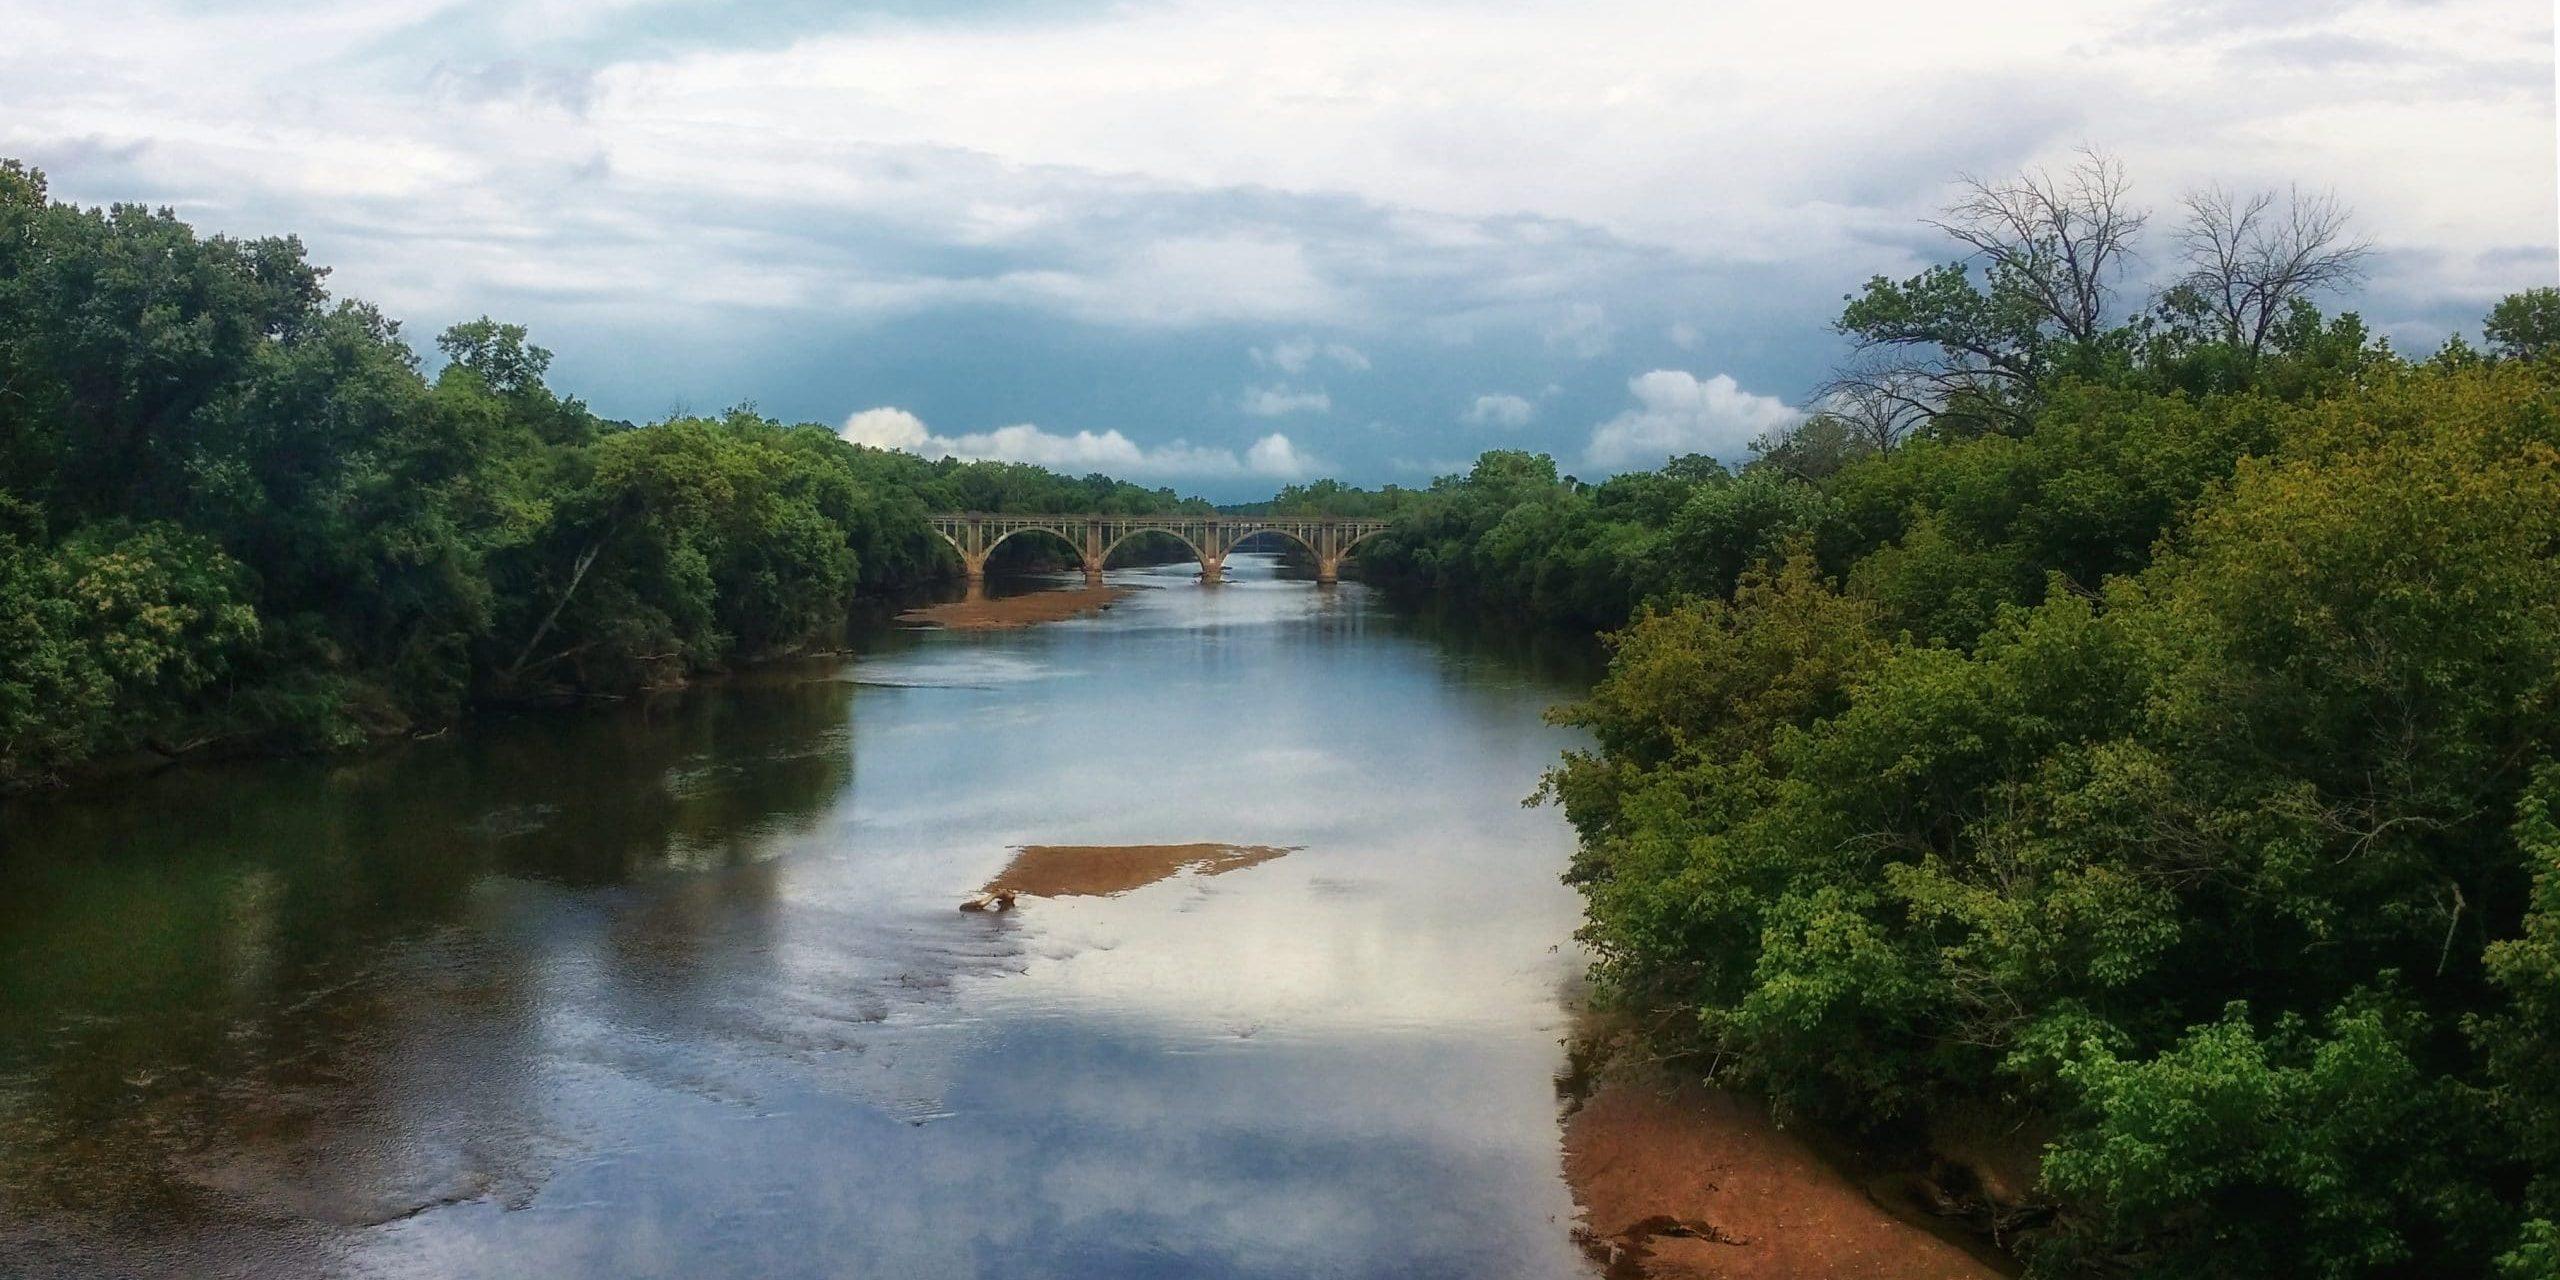 Rappahannock River view from Chatham Bridge